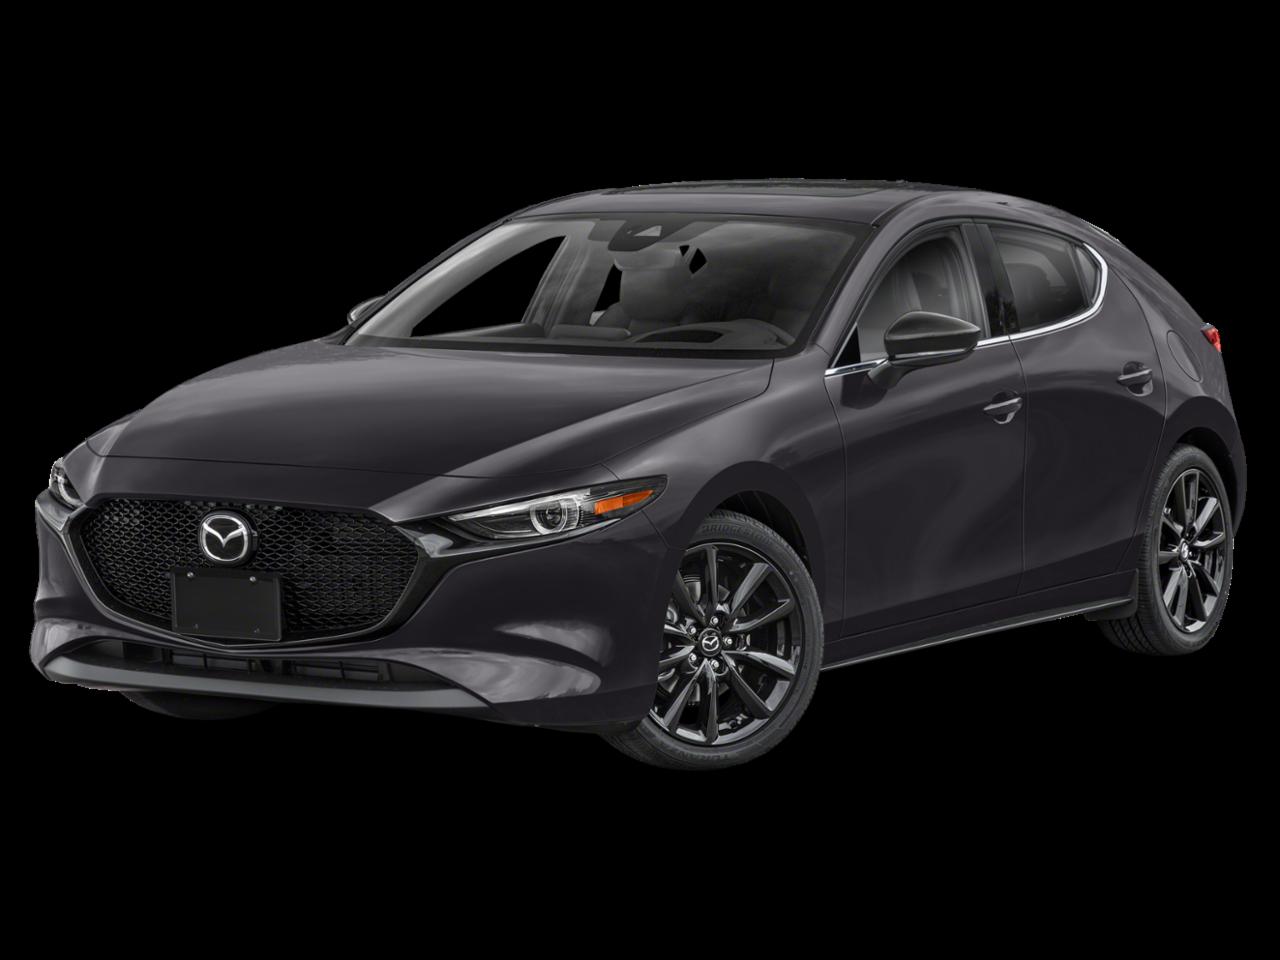 Mazda 2021 Mazda3 Hatchback 2.5 Turbo